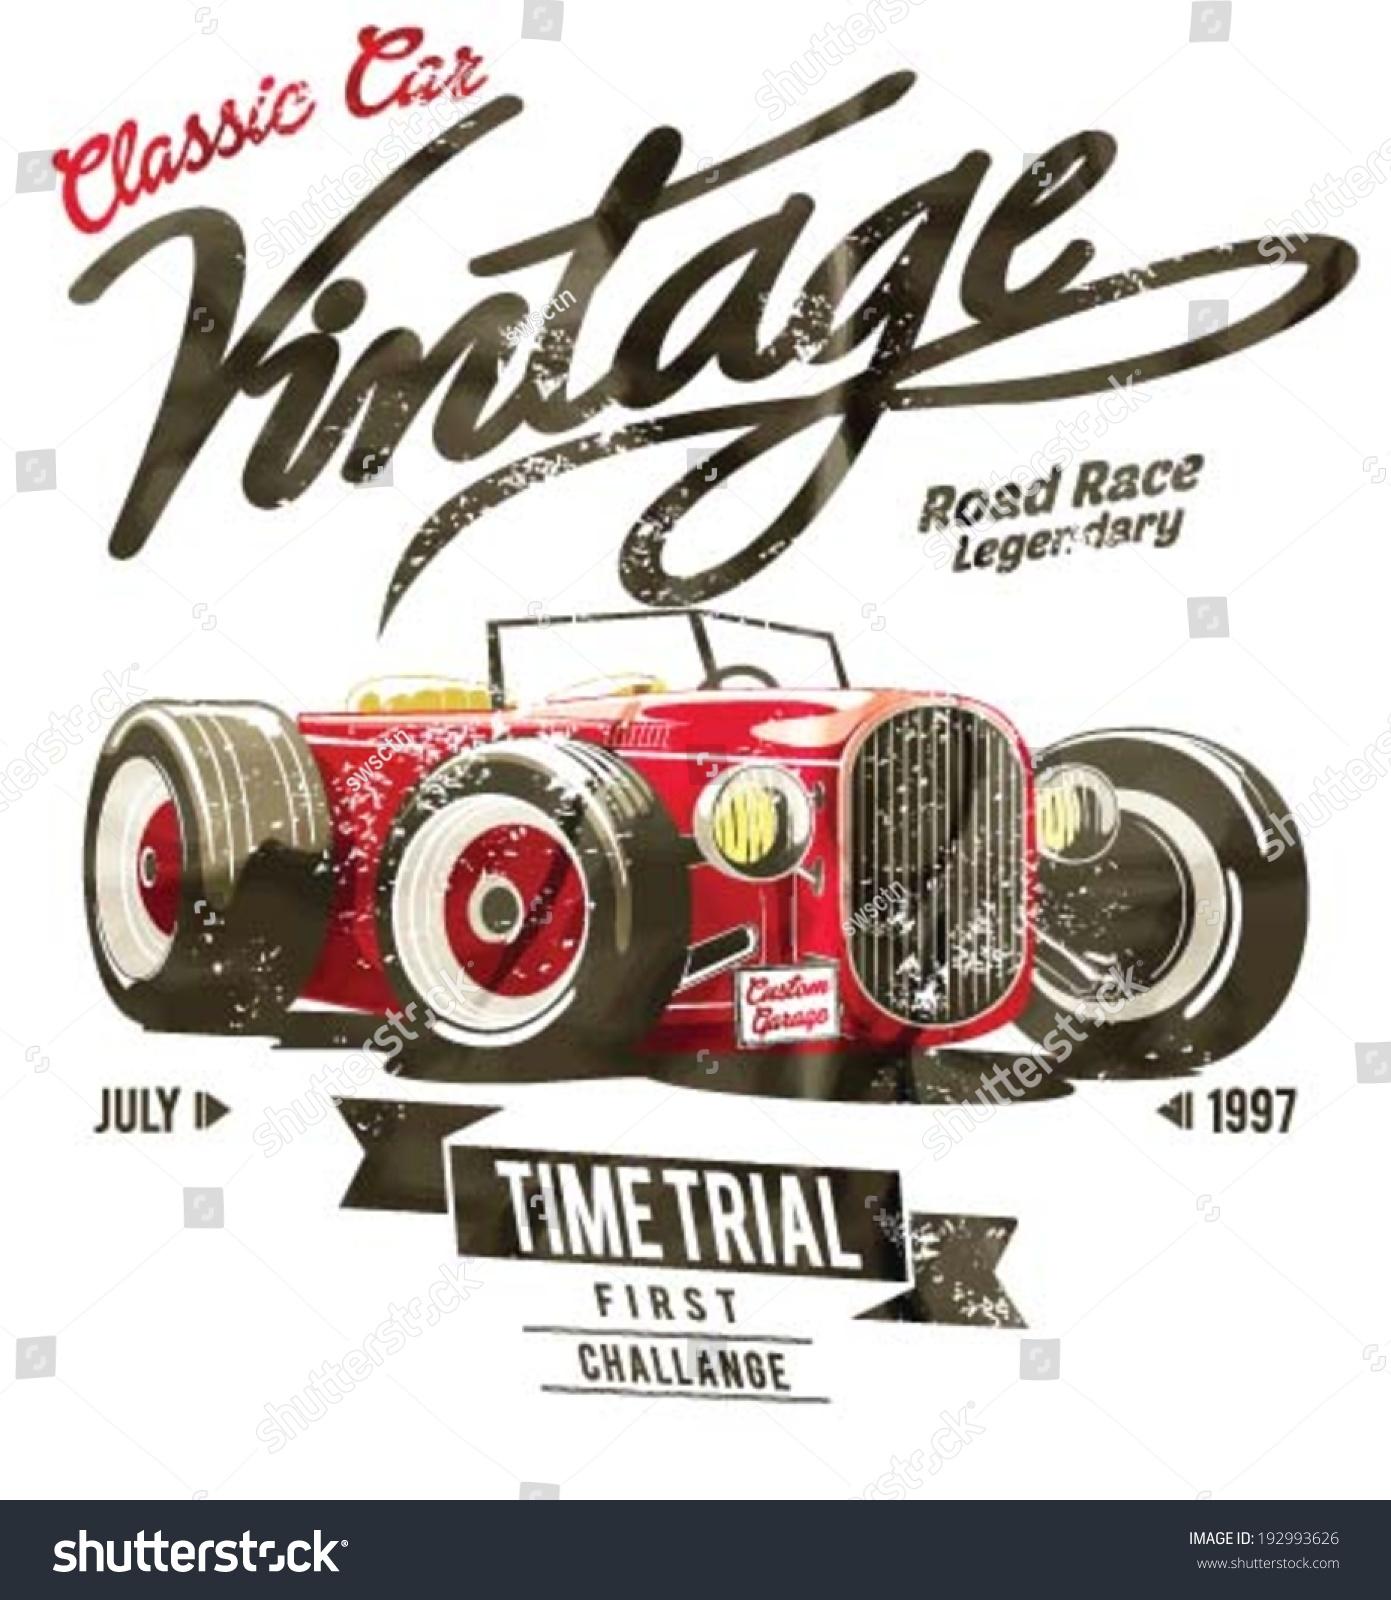 Racing Car Graphic Art Poster: Vector Old School Race Car Poster Stock Vector 192993626